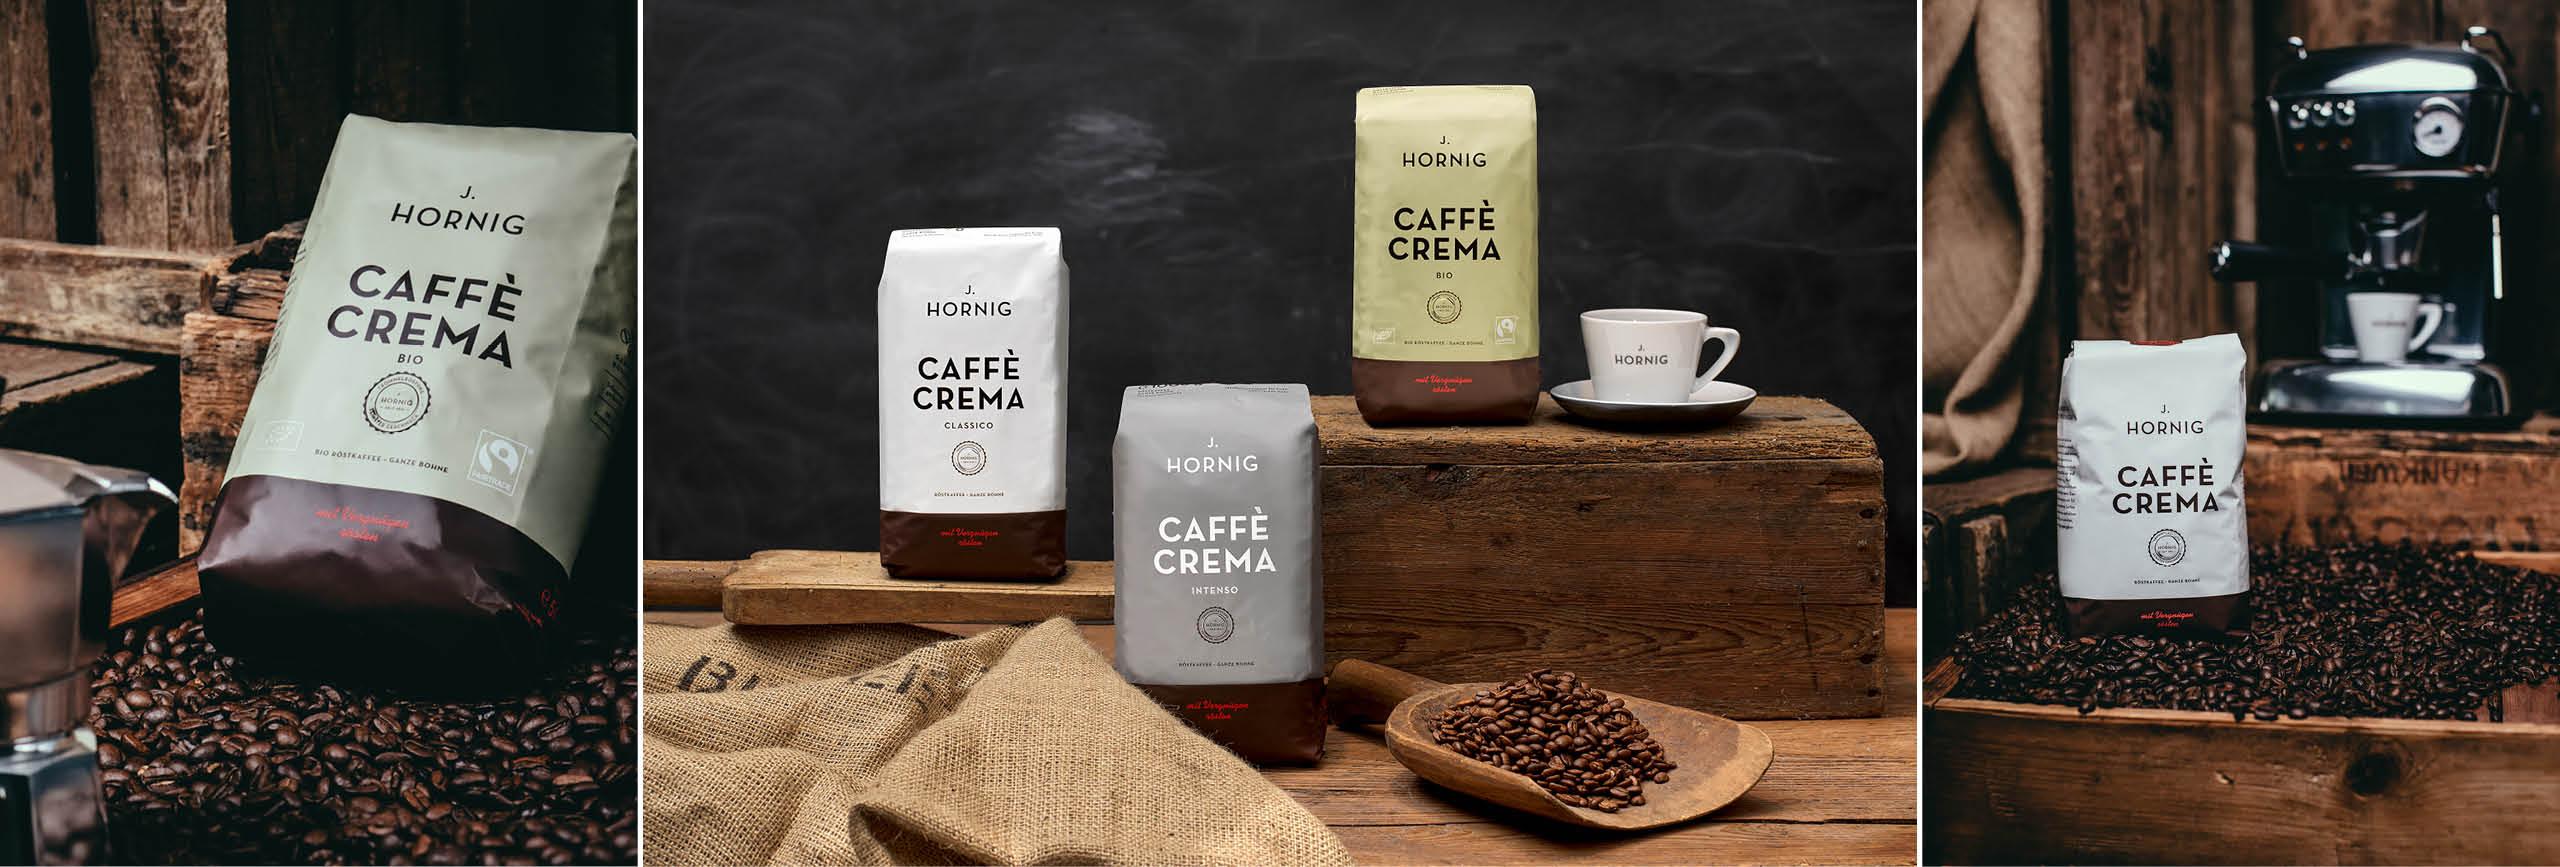 J. Hornig Caffe Crema Jahresvorrat